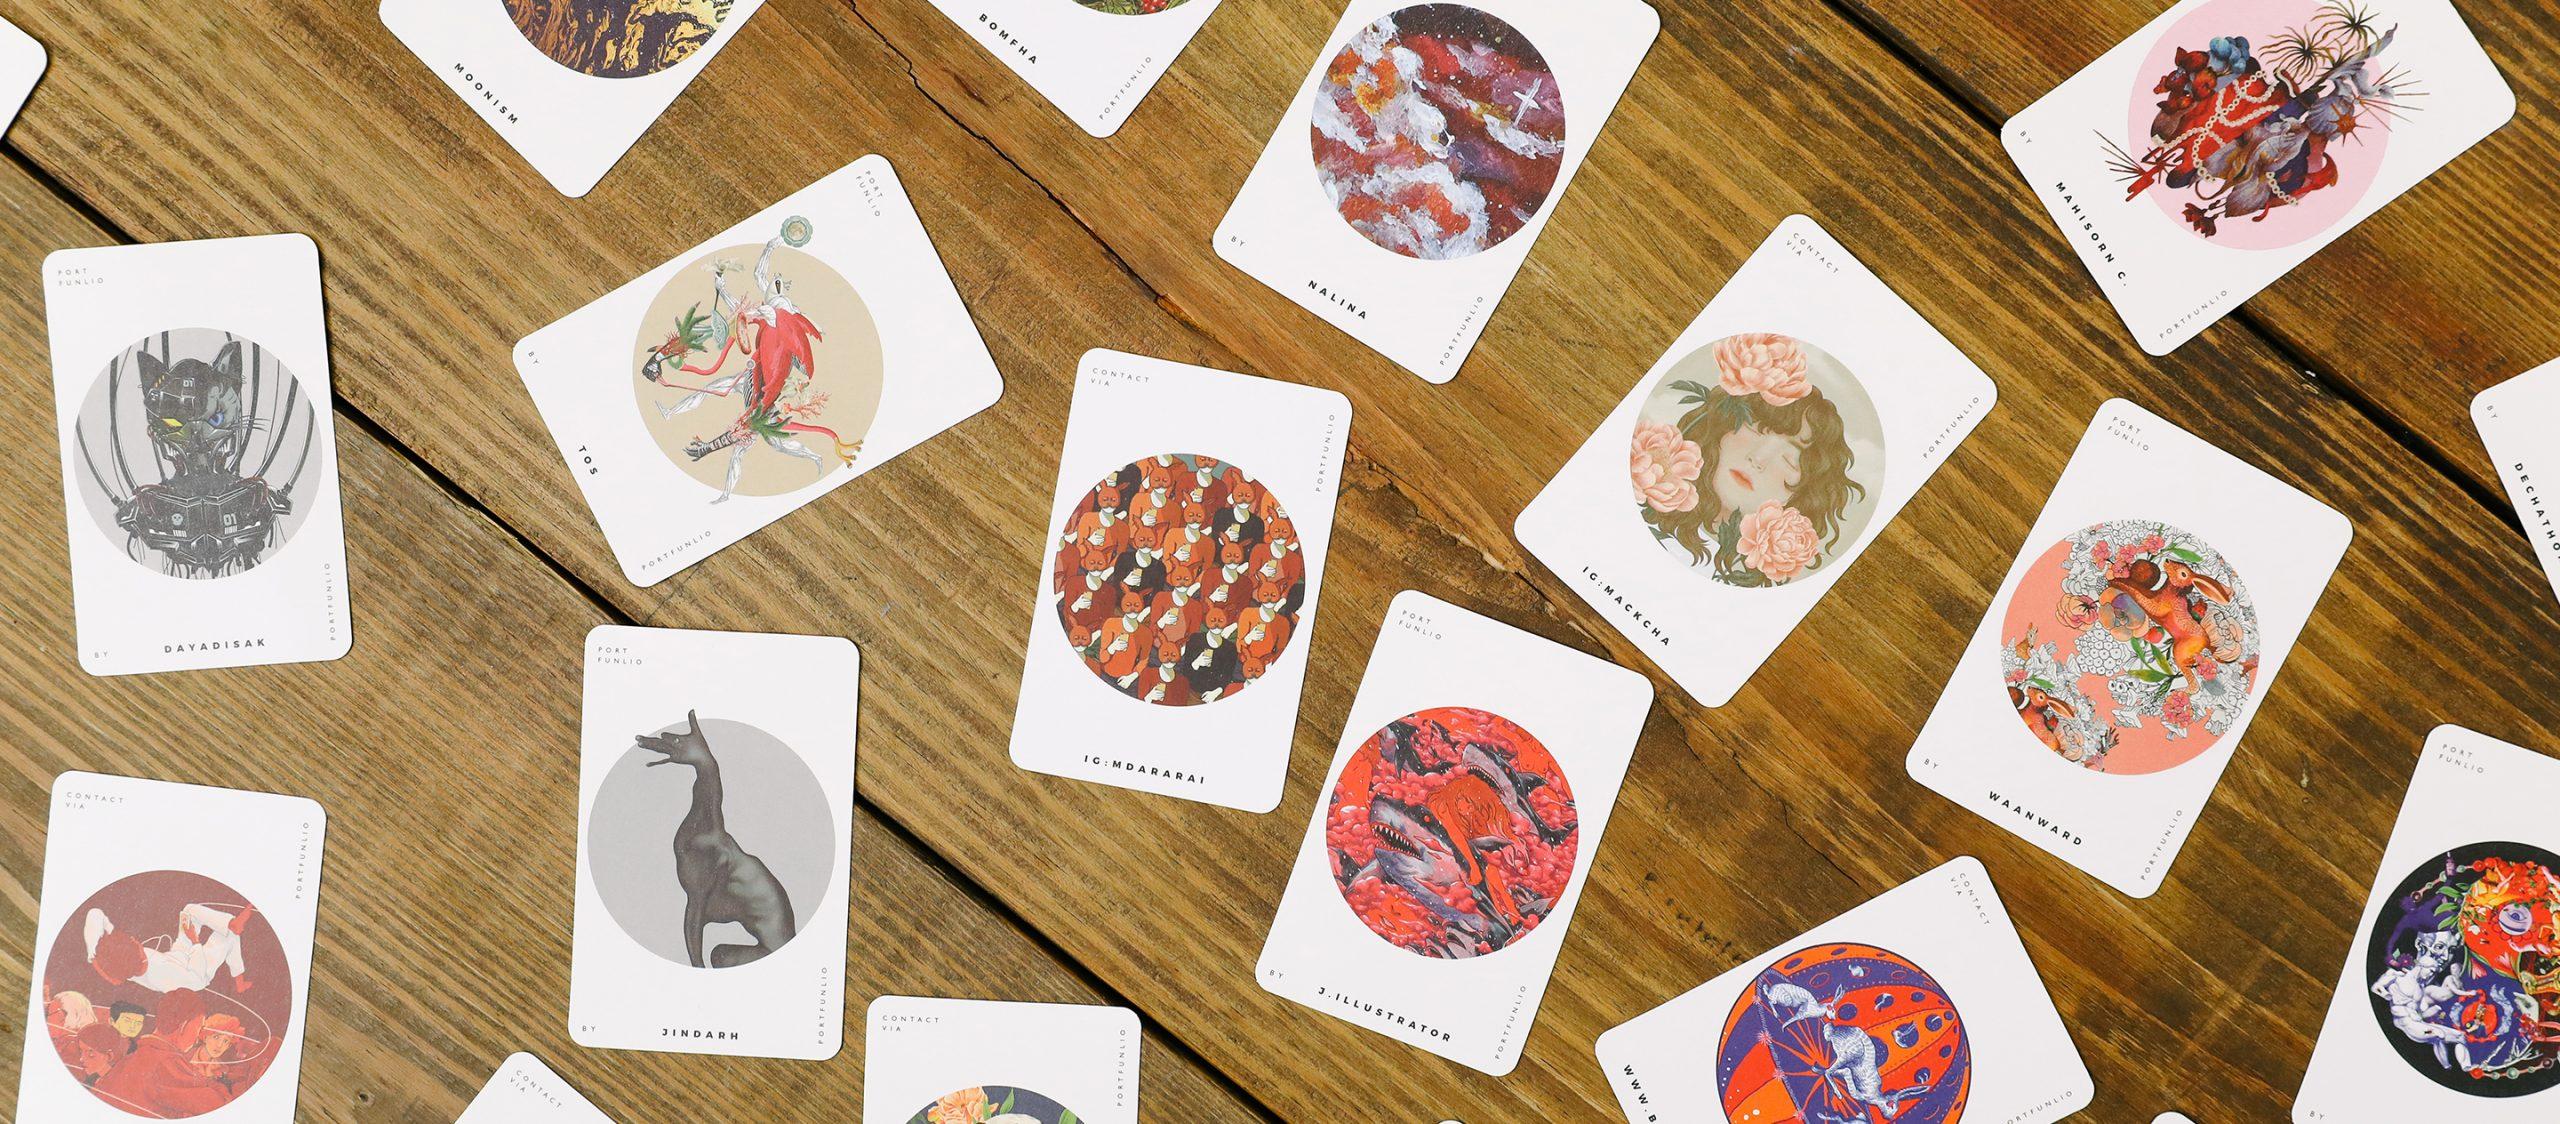 THE PORTFUNLIO   Matching Art Game จั่วการ์ดสุดอาร์ตที่ตั้งใจสร้างโอกาสการจ้างงานให้ศิลปินหน้าใหม่